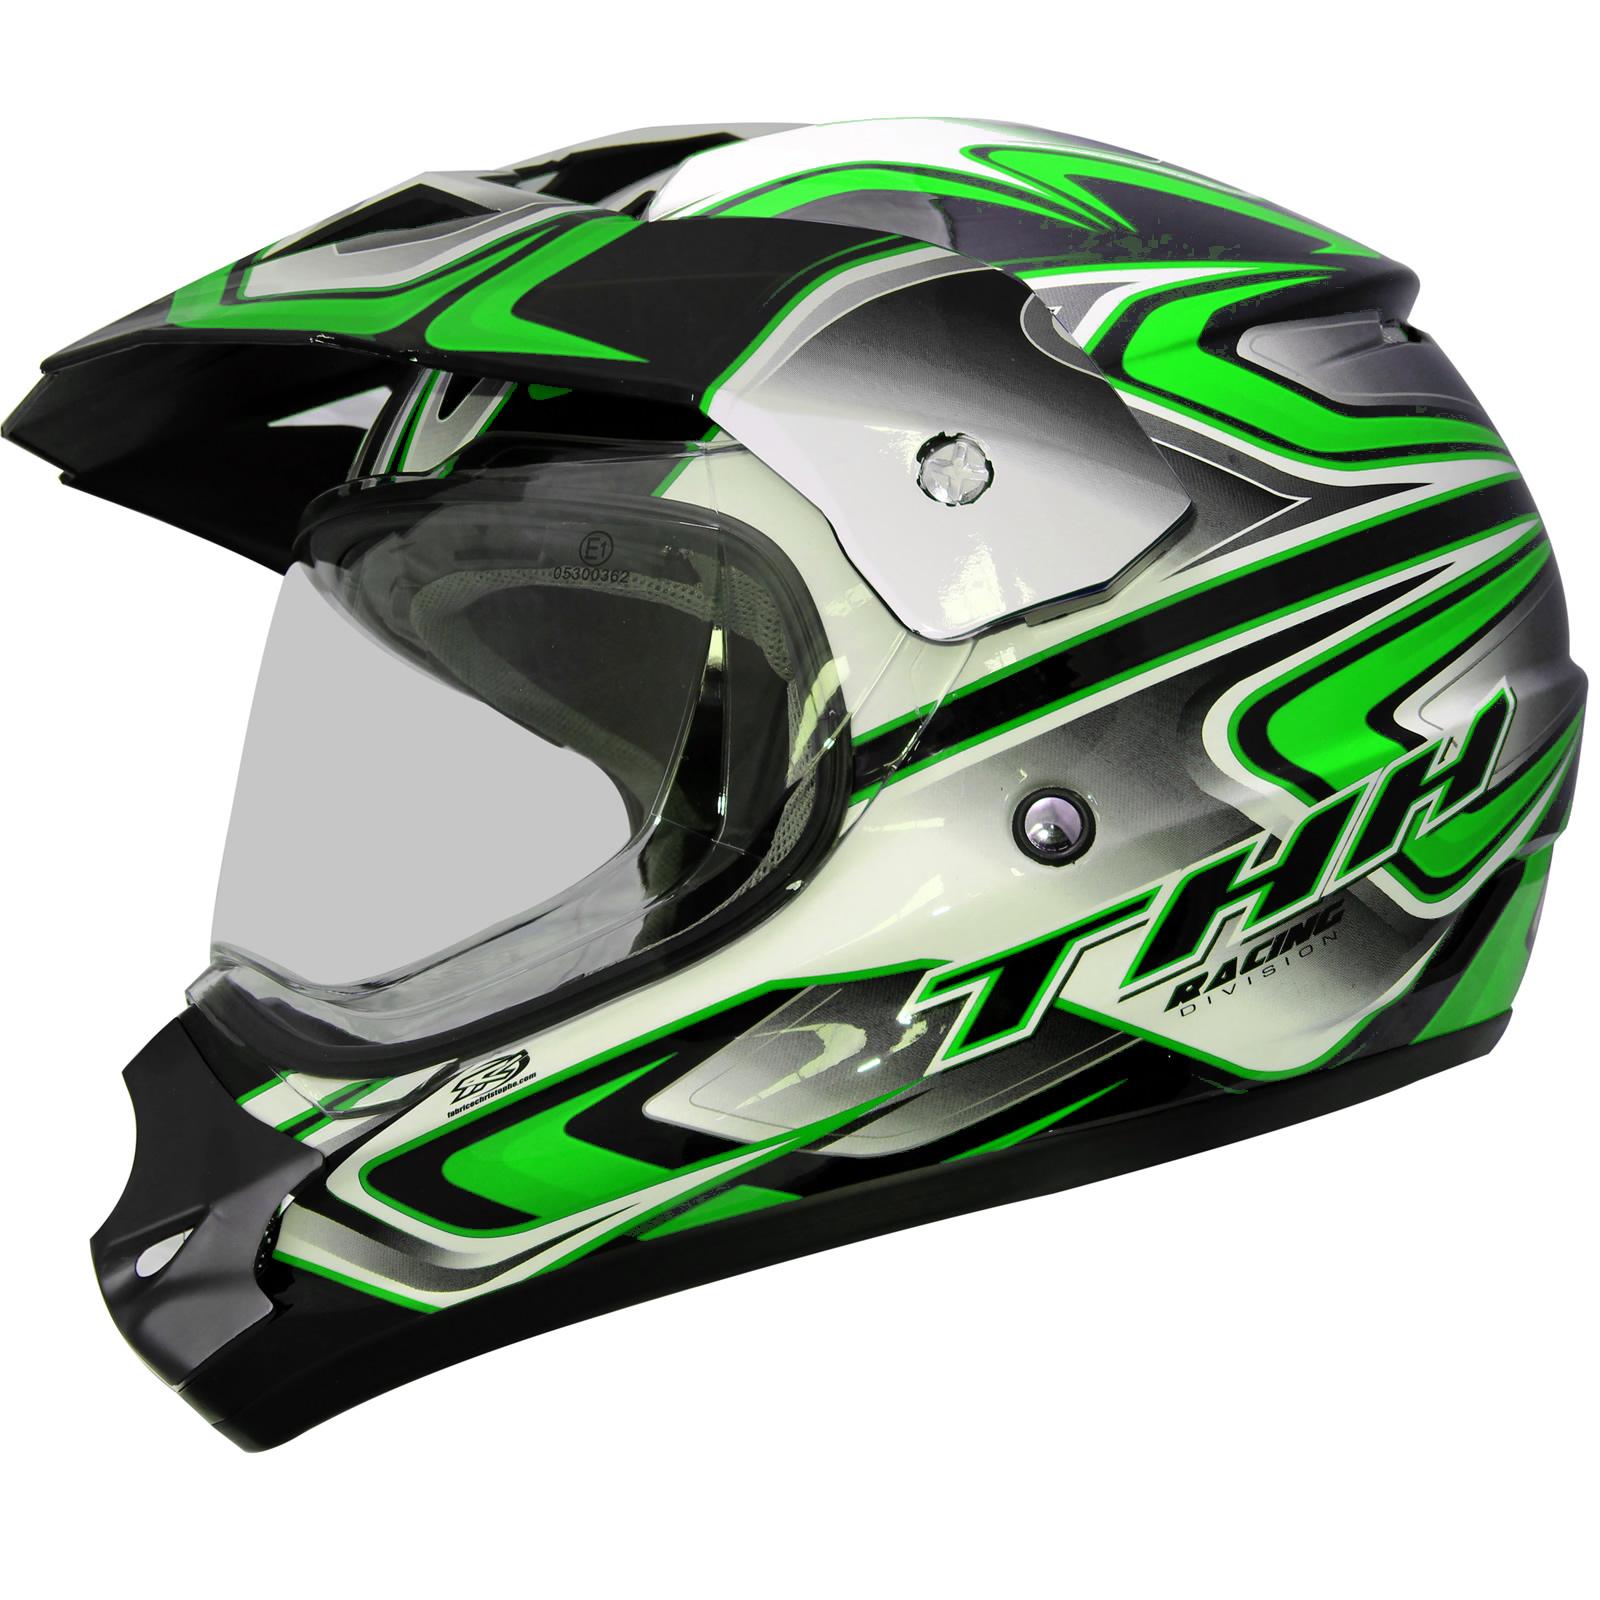 ... Green Dual Sport Helmet MX Motocross ATV Motorbike Motorcycle | eBay